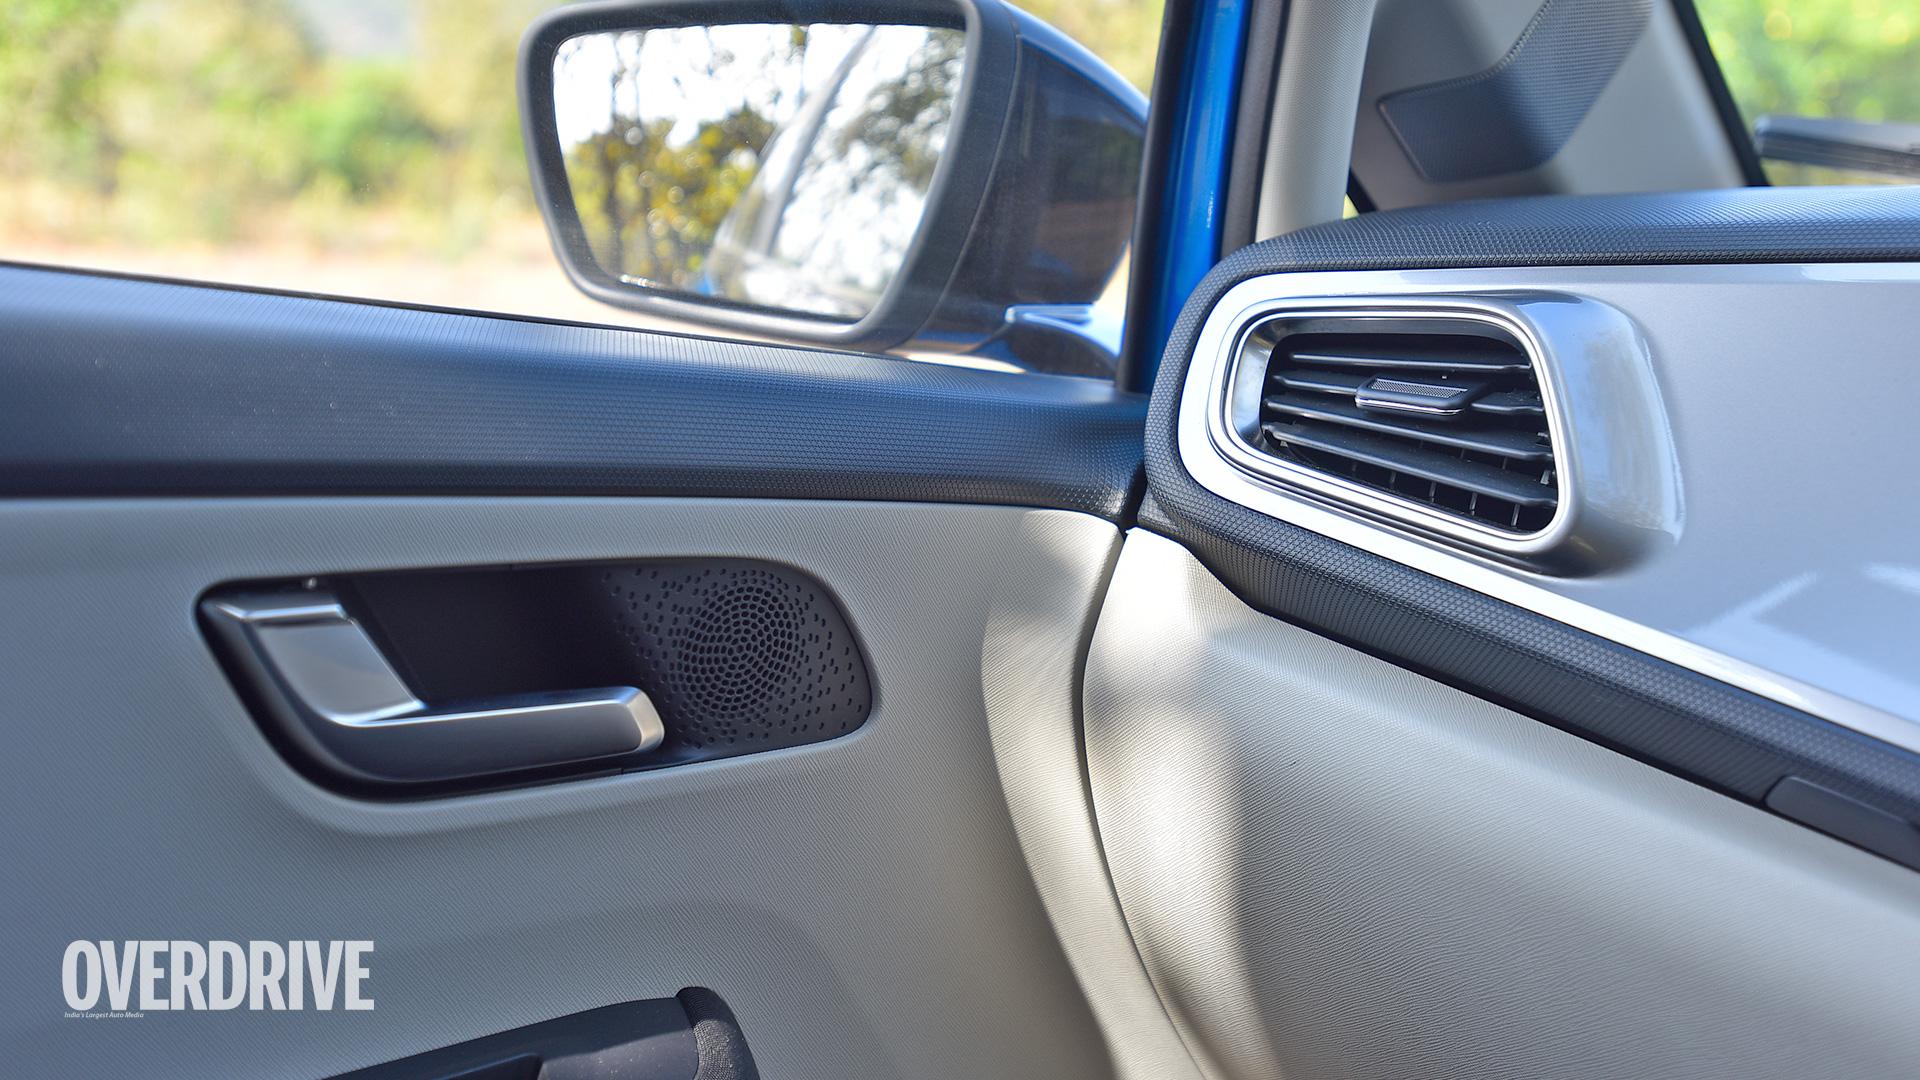 Tata Altroz 2021 XZ Plus i-Turbo Petrol Exterior